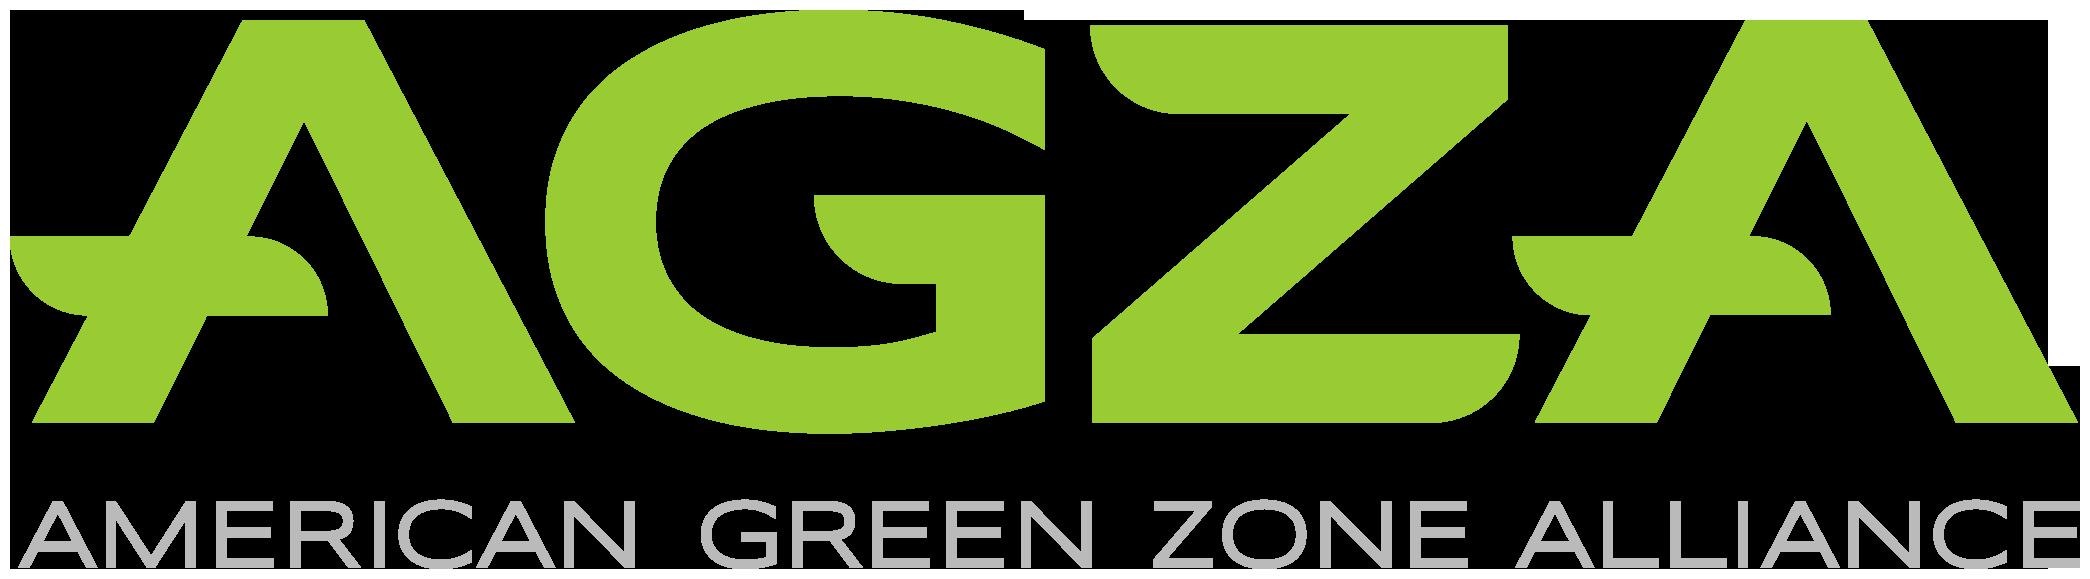 AGZA_logo_green-and-gray